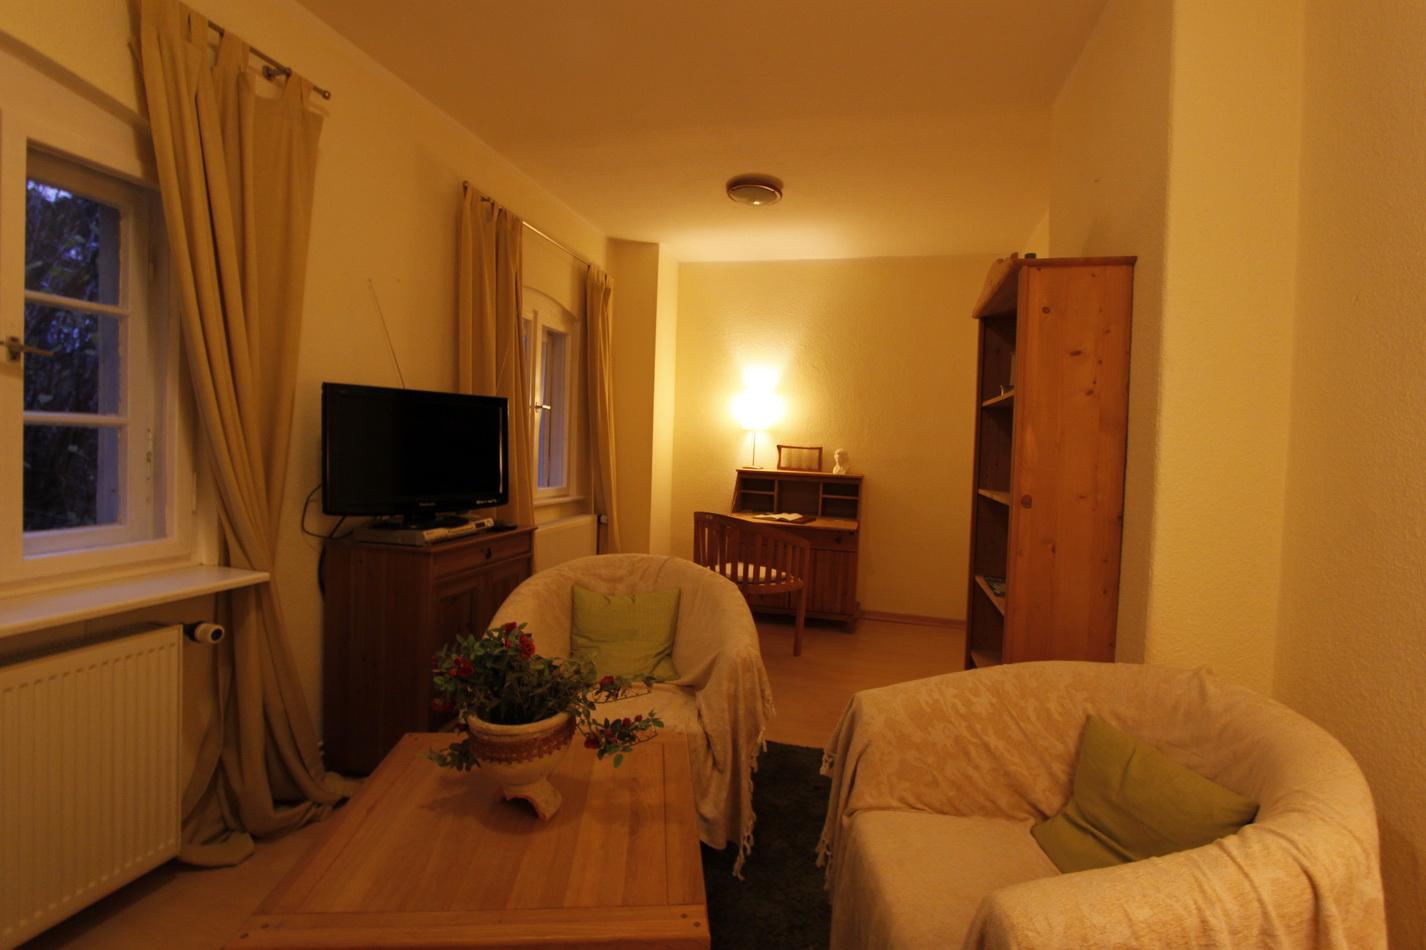 ferienwohnung potsdam berlin potsdam rehbr cke. Black Bedroom Furniture Sets. Home Design Ideas